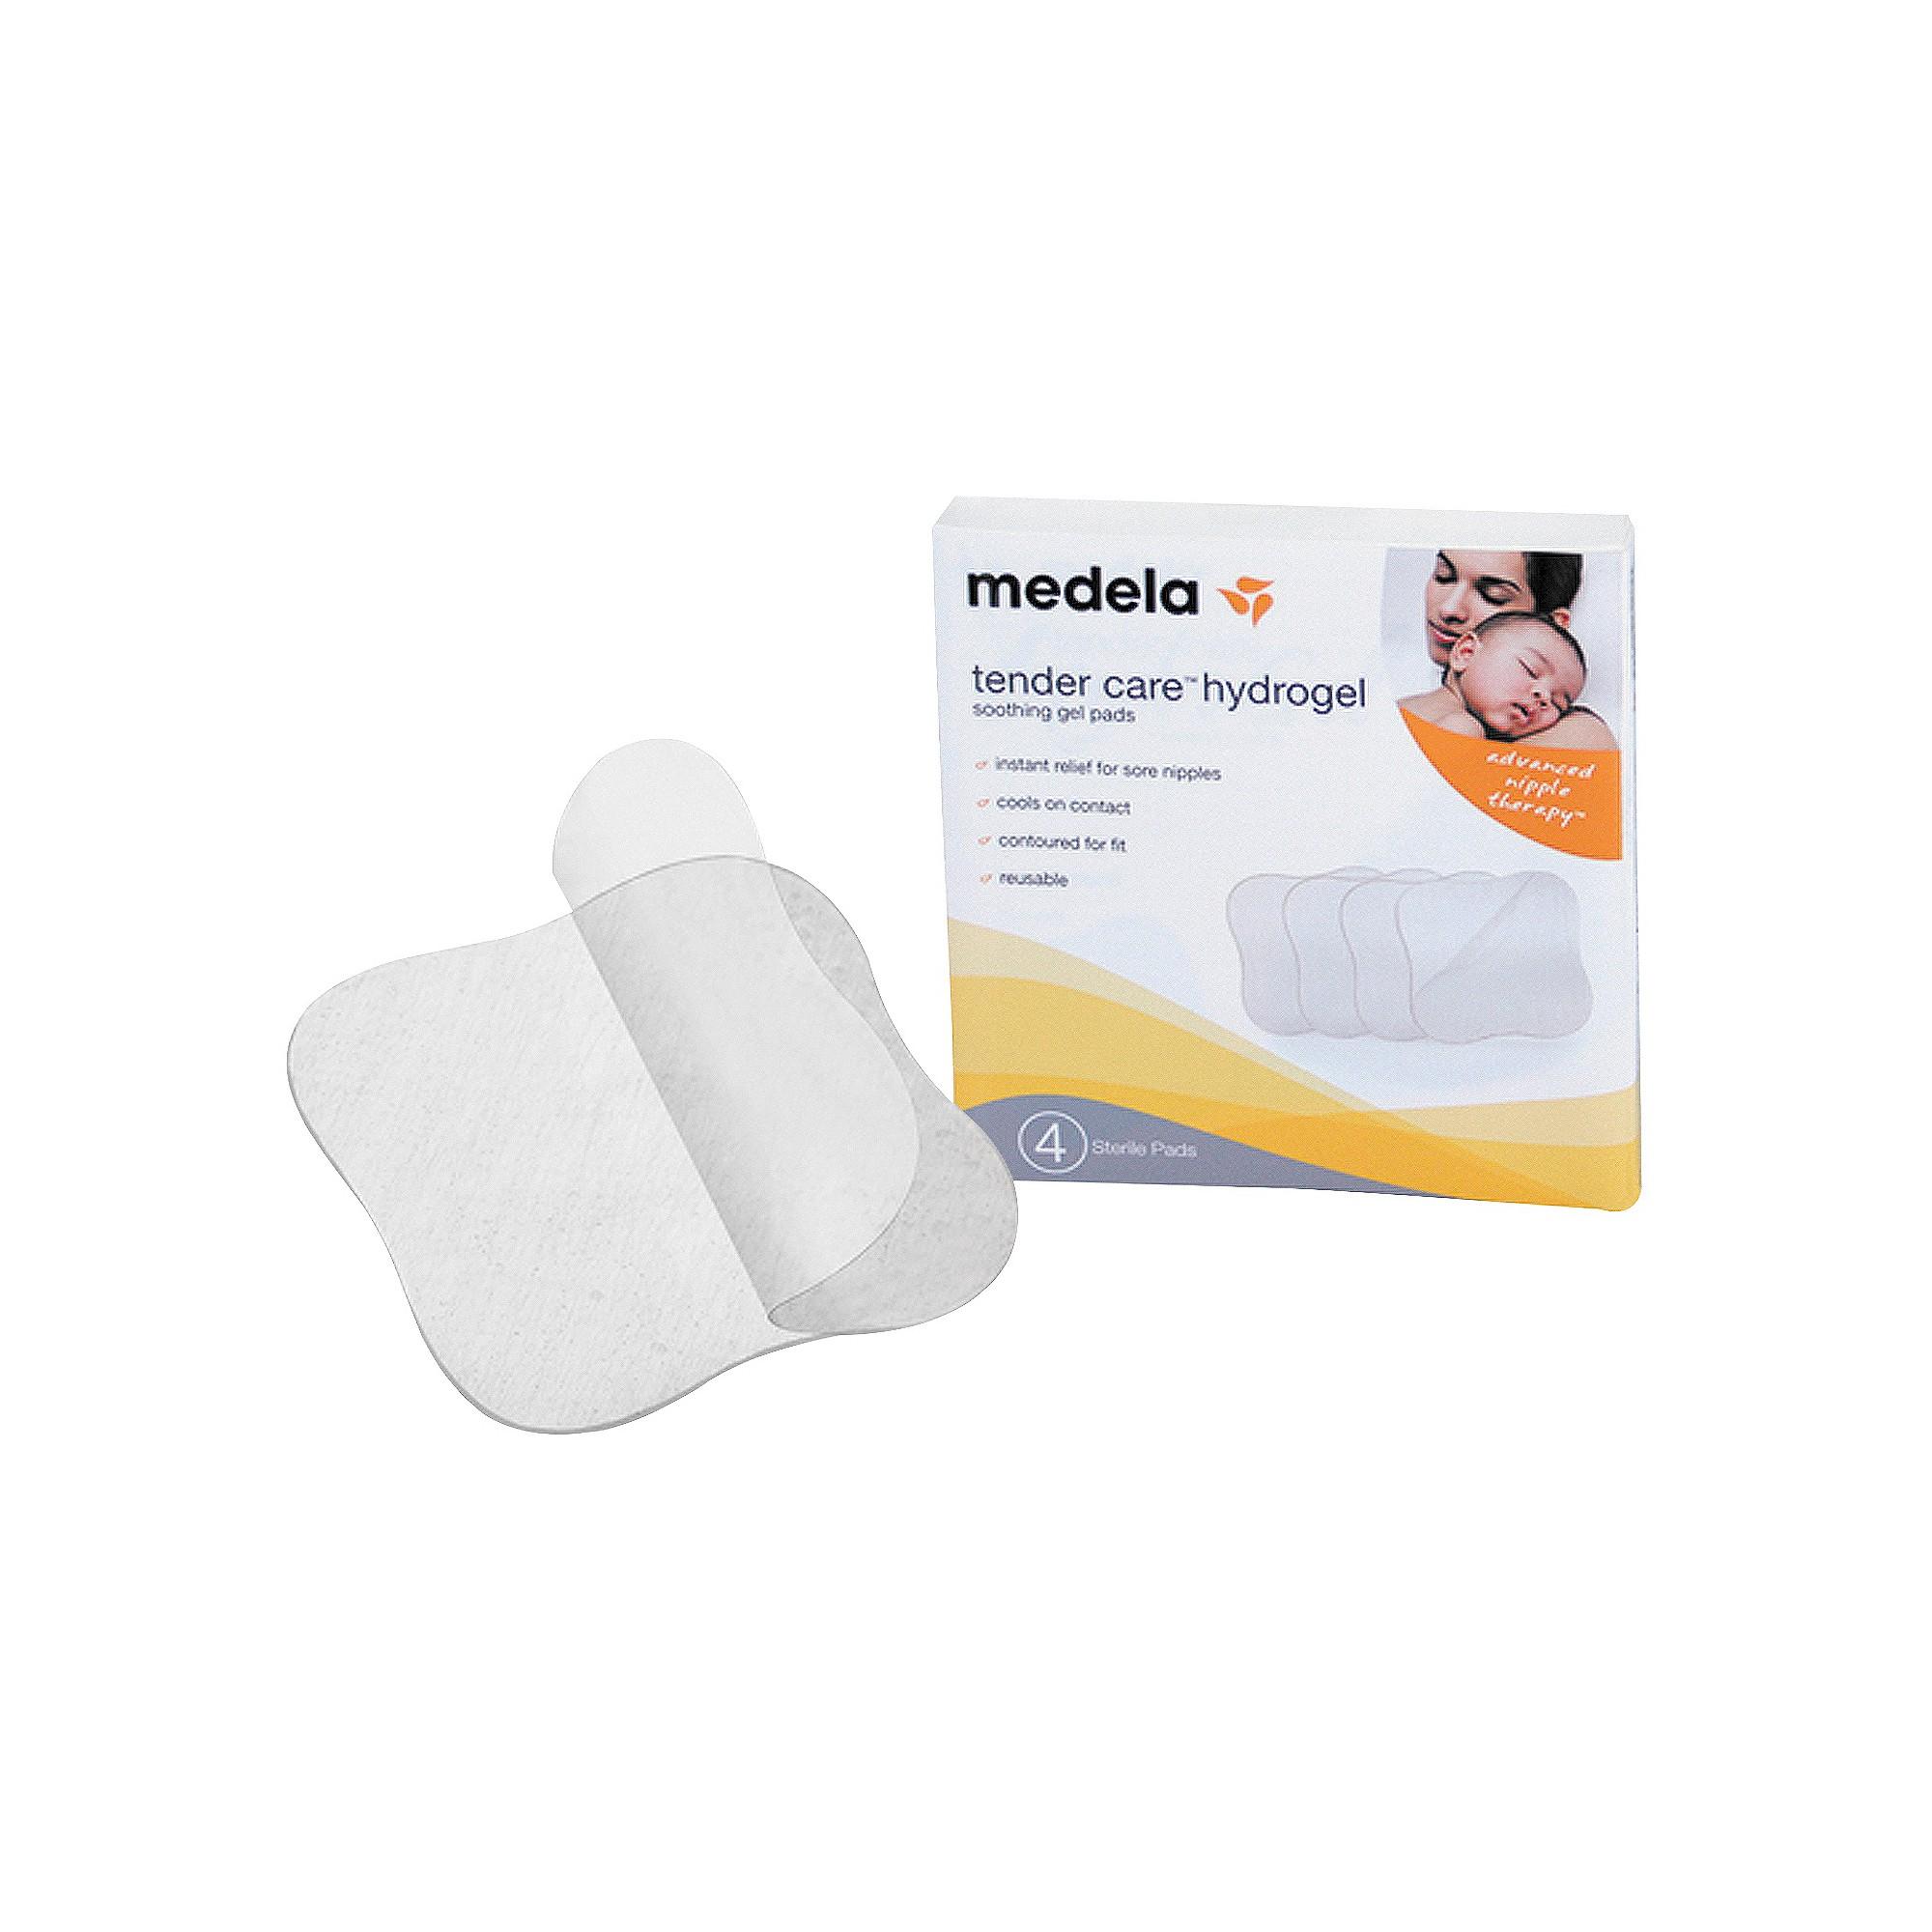 Medela Tender Care HydroGel Pads - 4pk, Clear